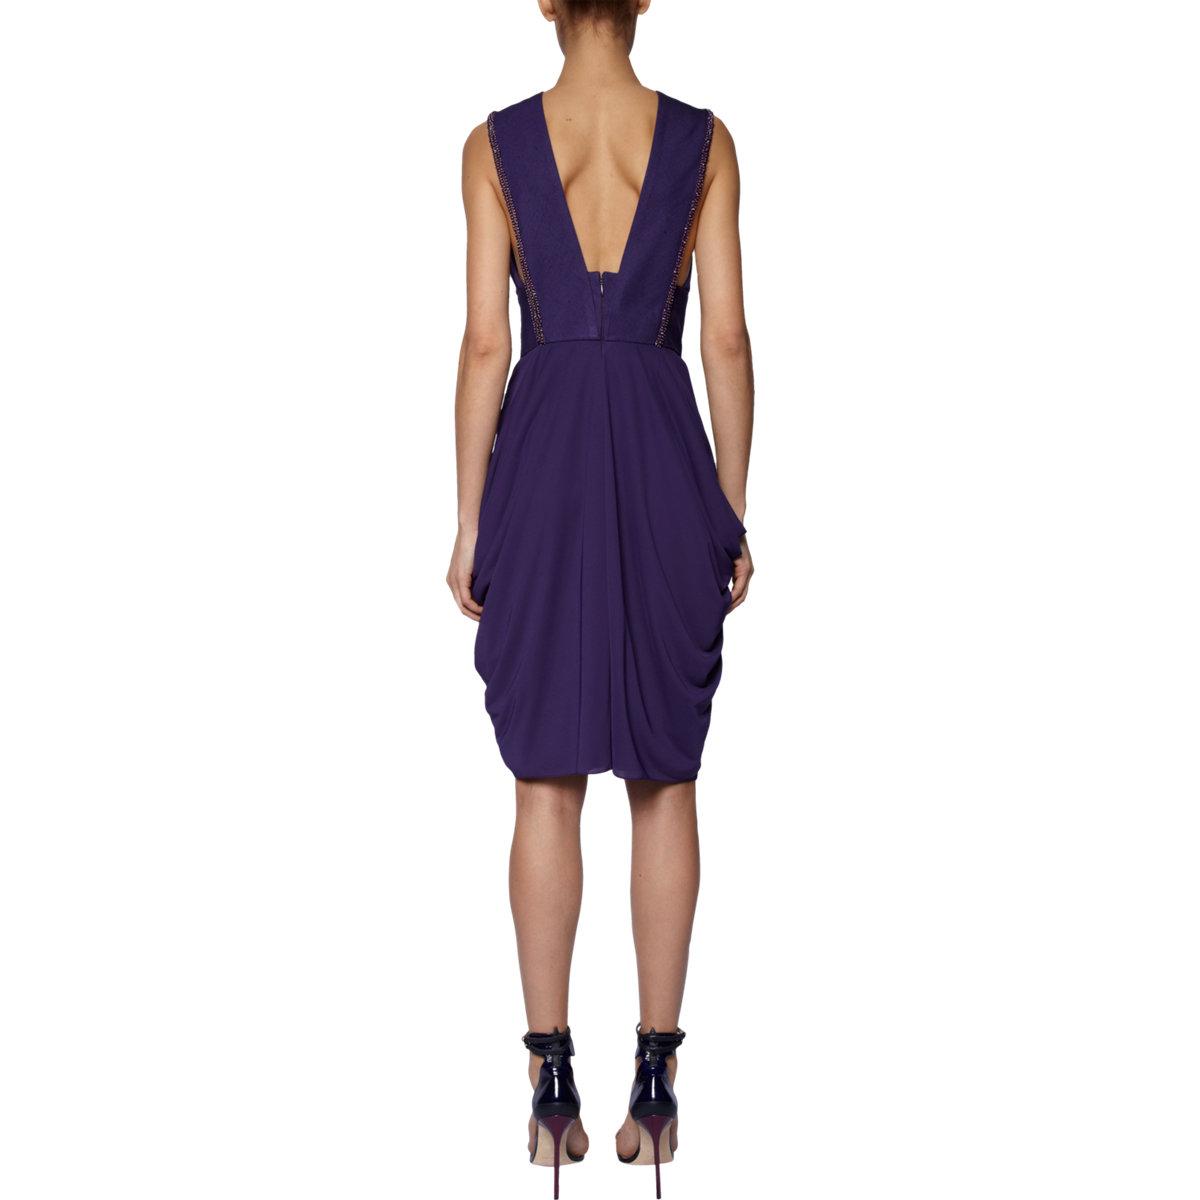 J. Mendel Beaded Halter Dress in Purple -